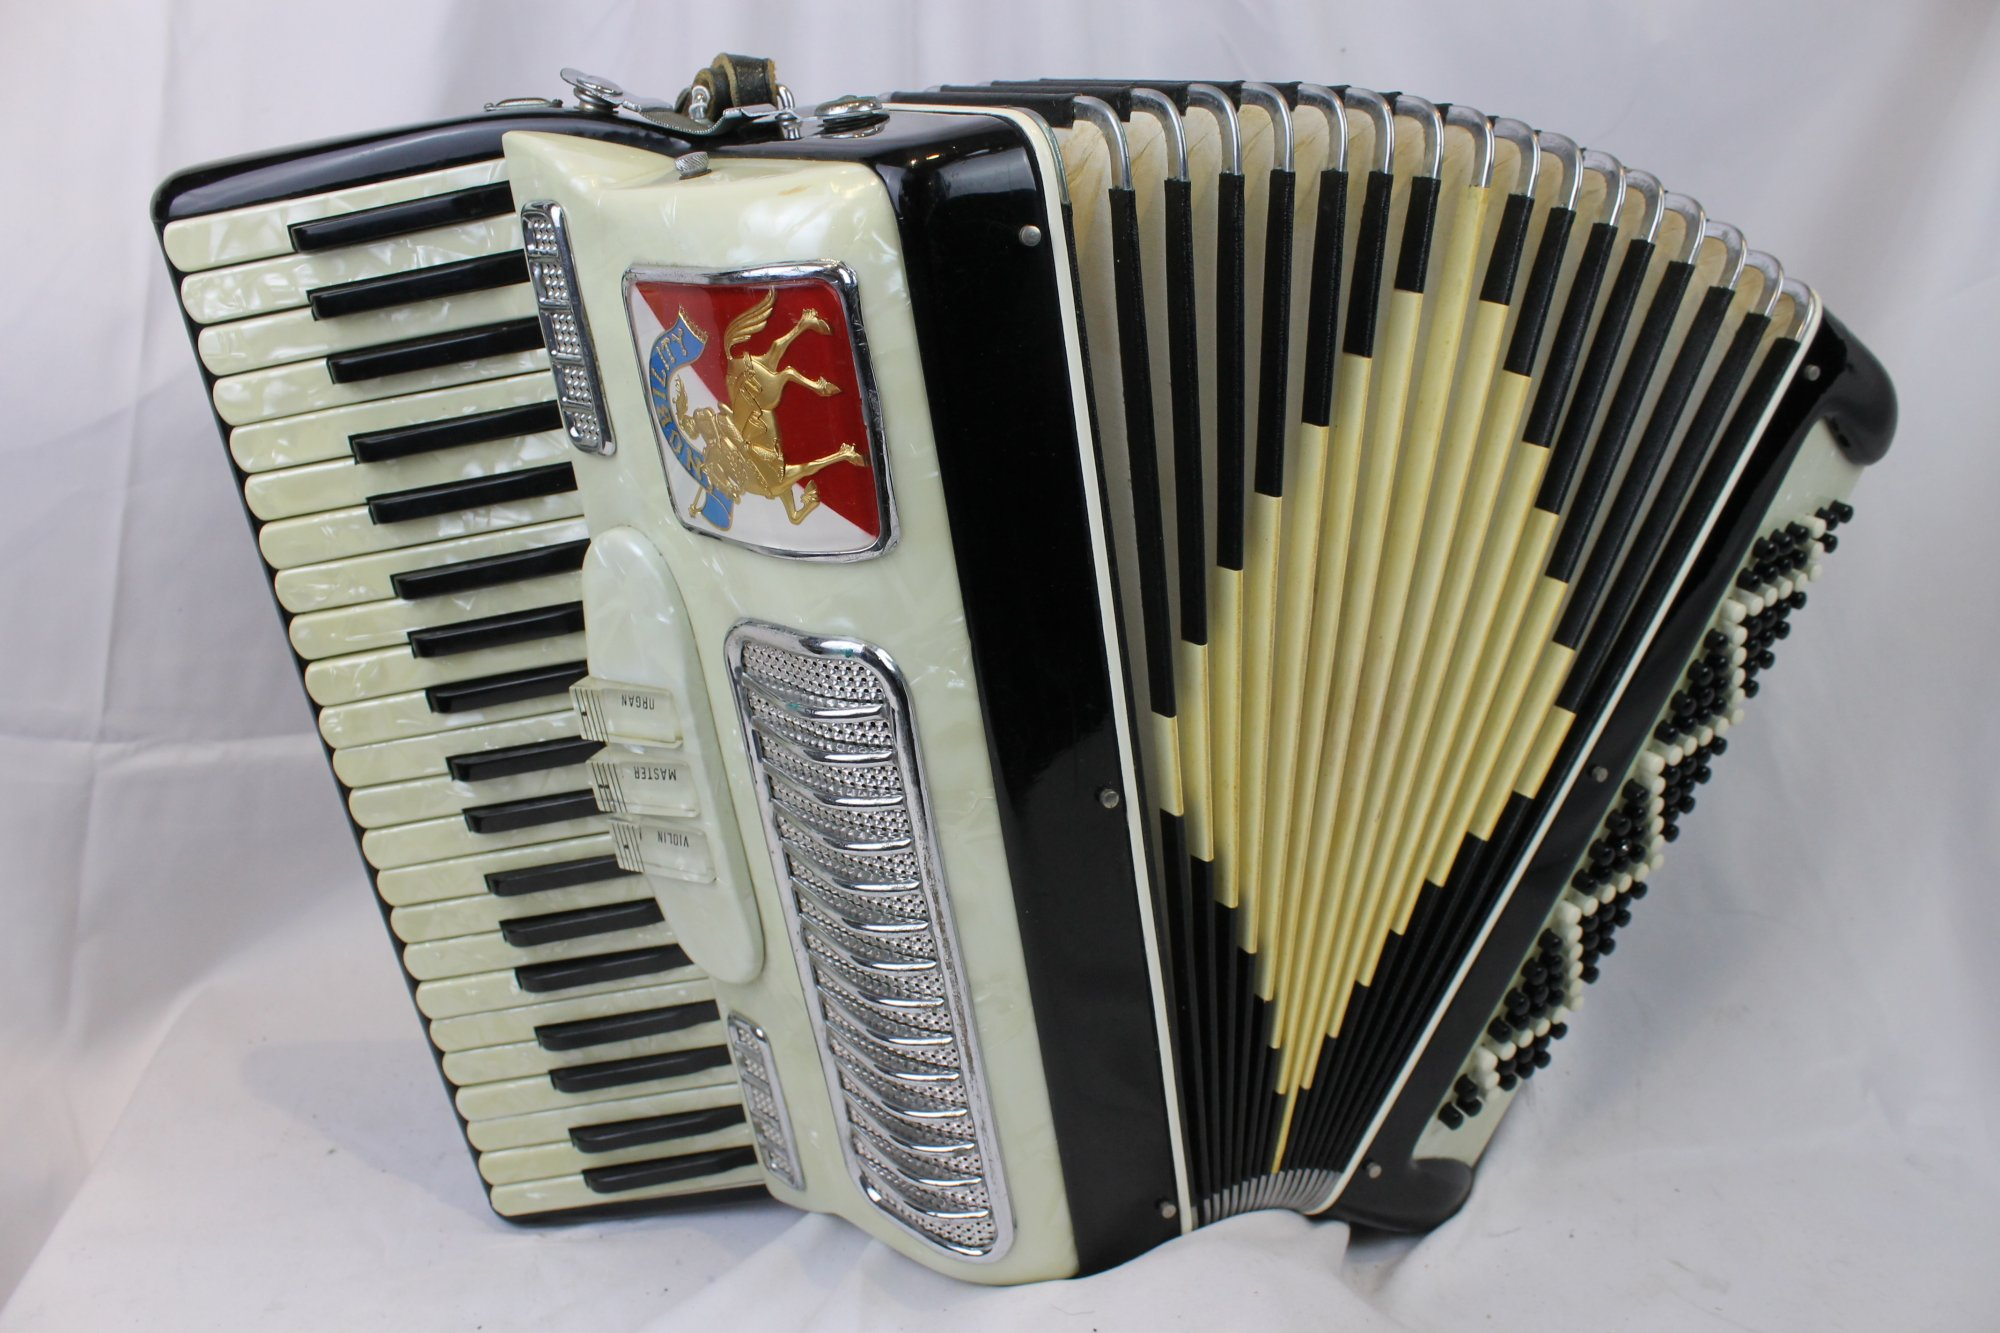 3684 - Black White Noble Nobility Piano Accordion LM 41 120